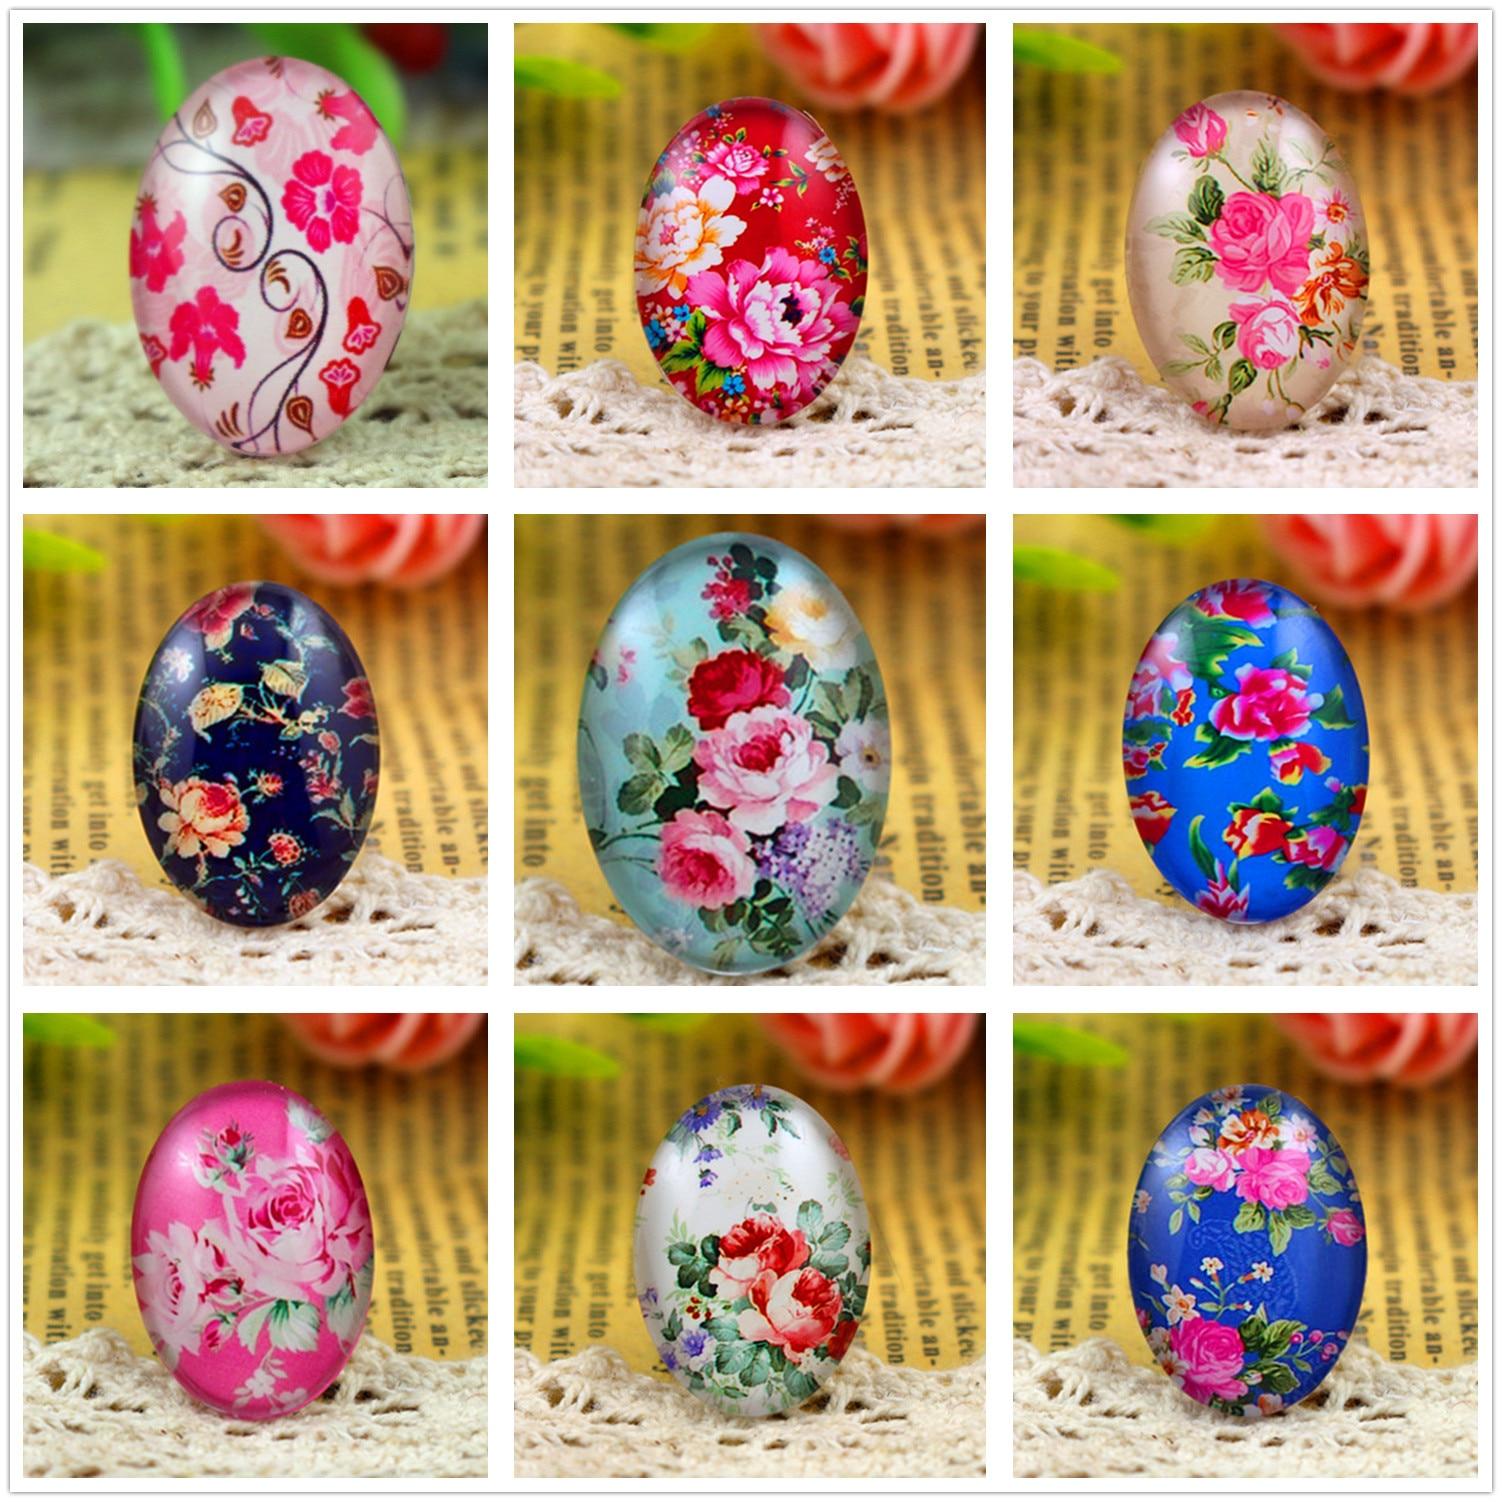 Hot Sale 10pcs 18x25mm 9 Style Flower  Handmade Photo Glass Cabochons